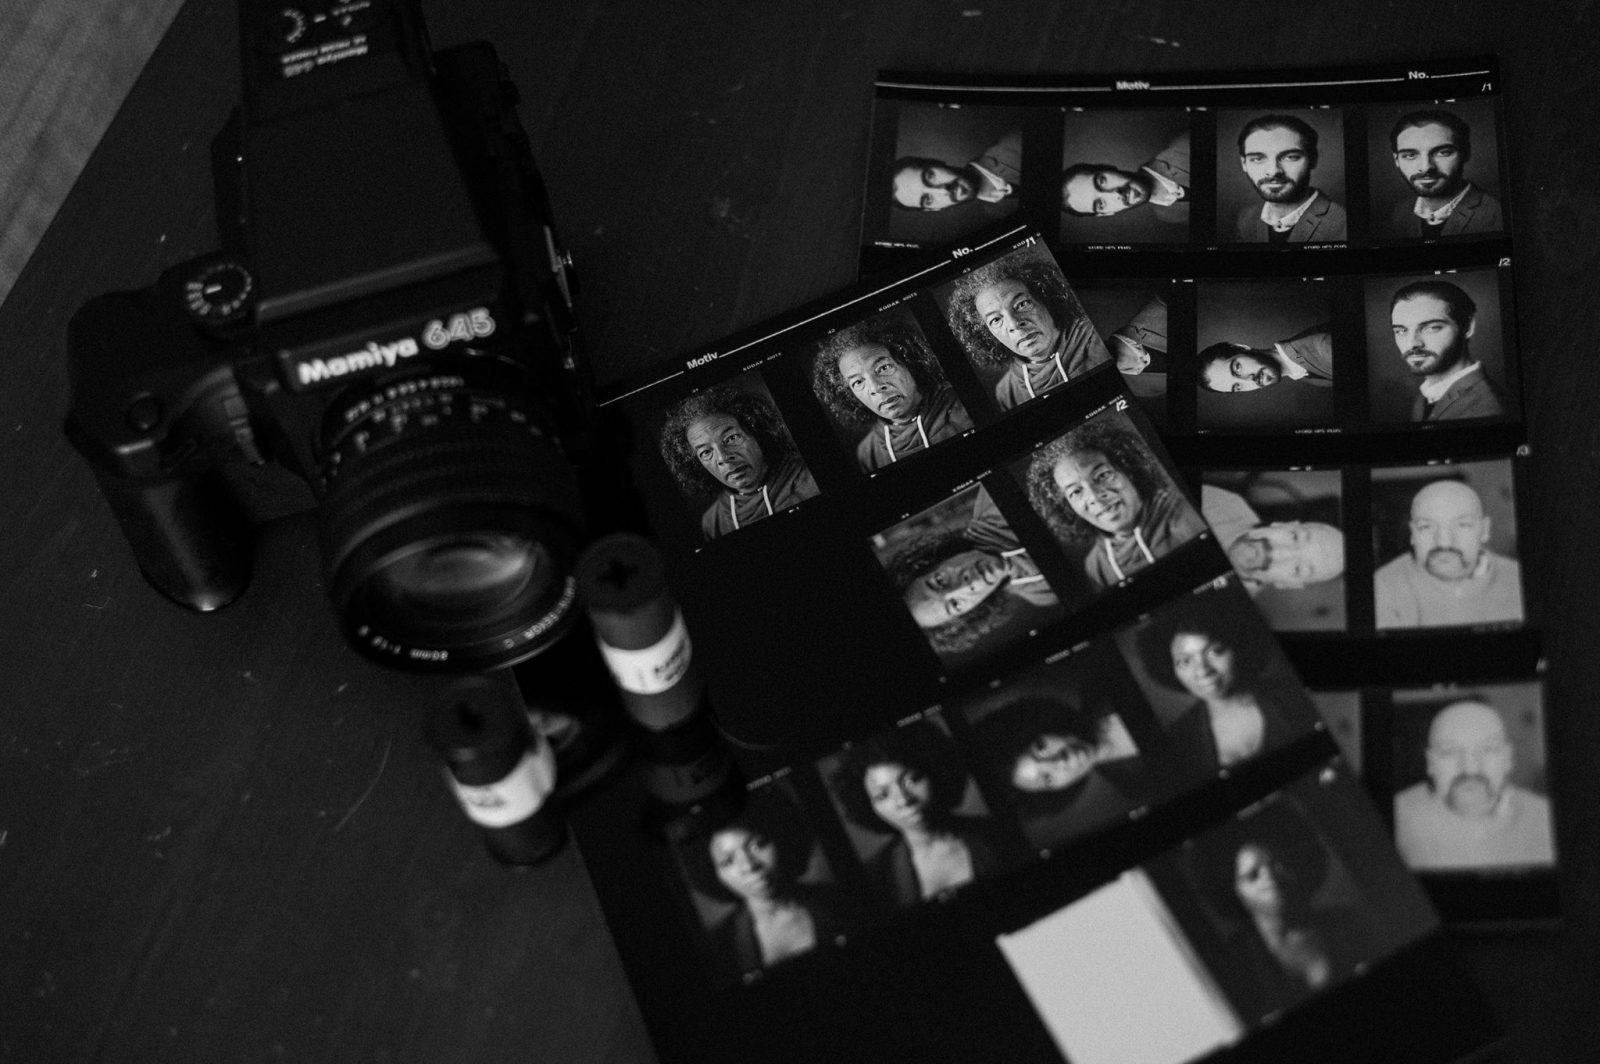 Kontaktabzug Film Analogfotografie Schwarzweißportraitfotografie Mamiya 645 Rollfilm 120 Fotostudio Dresden Schwarzweißportraitfotografie